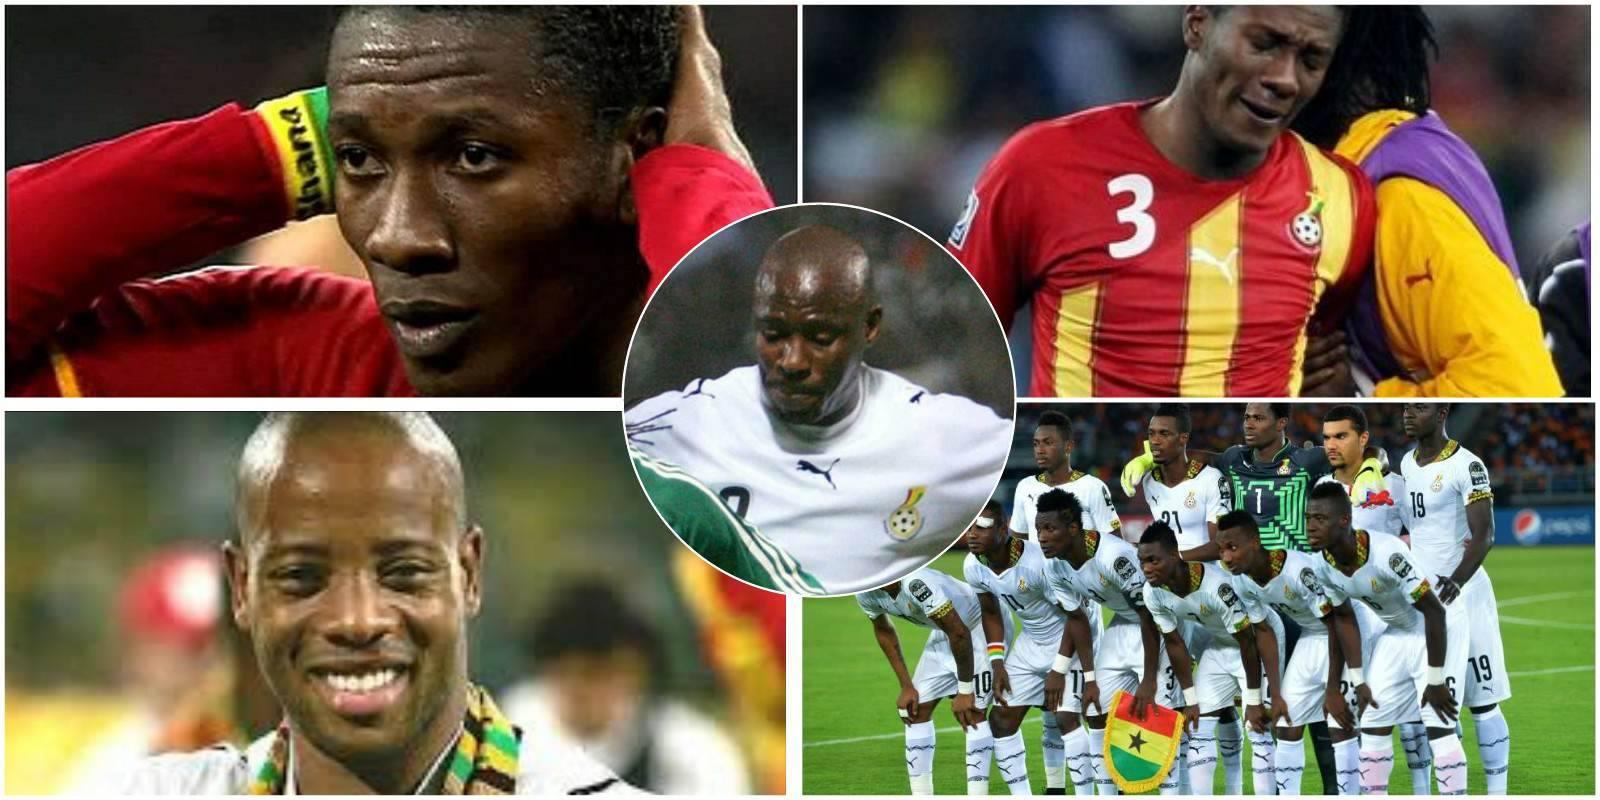 http://www.gossipmail.co/2017/11/braking-former-ghana-player-dies-at-36.html